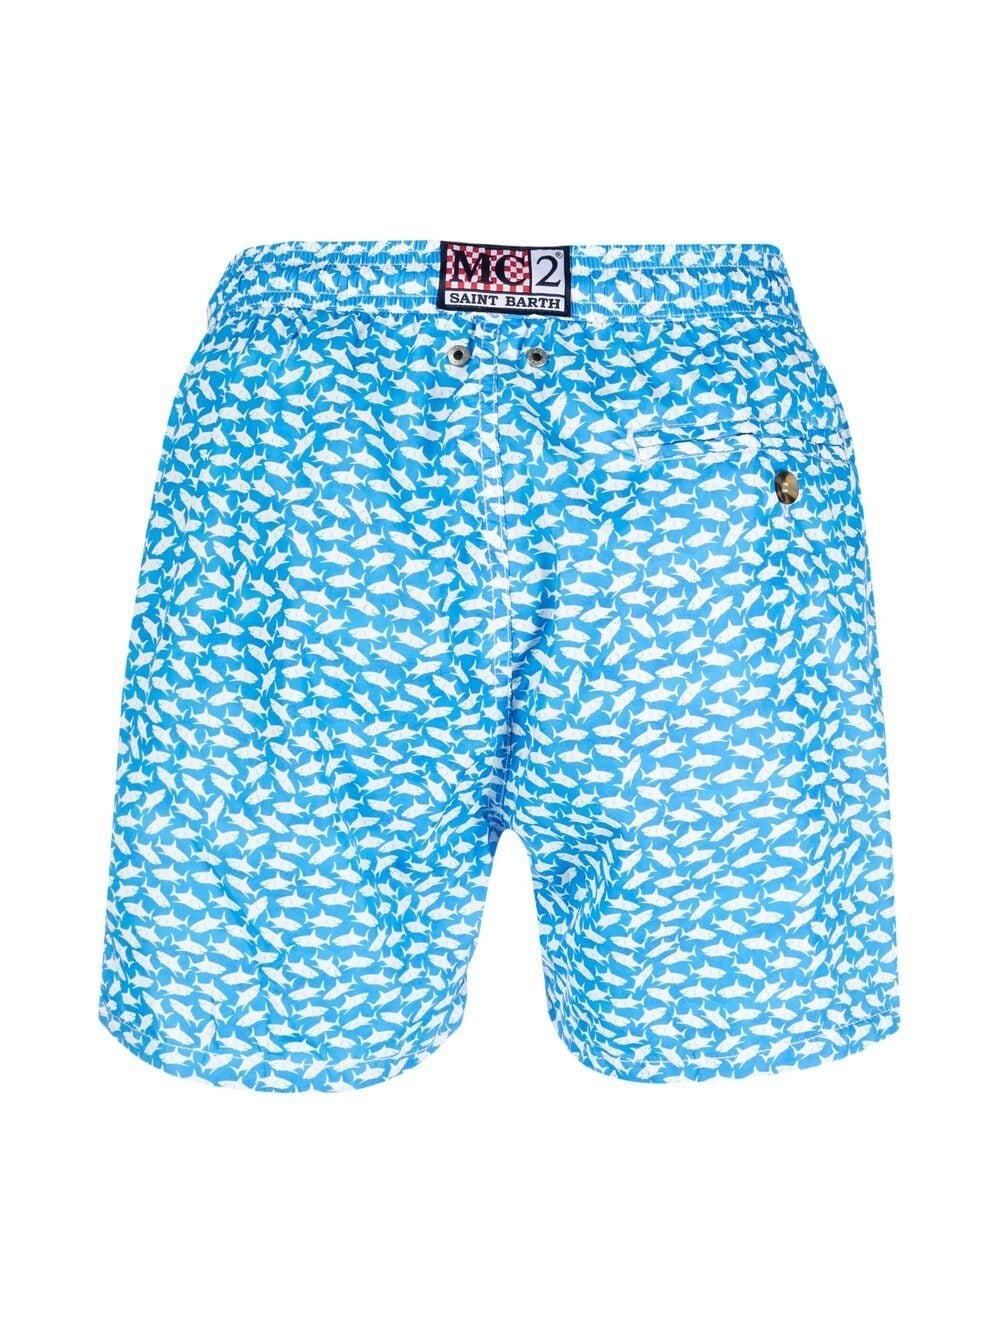 Sky blue and white recycled material shark-print swim shorts MC2 |  | LIGHTING MICRO FANTASY-BALIKA3117